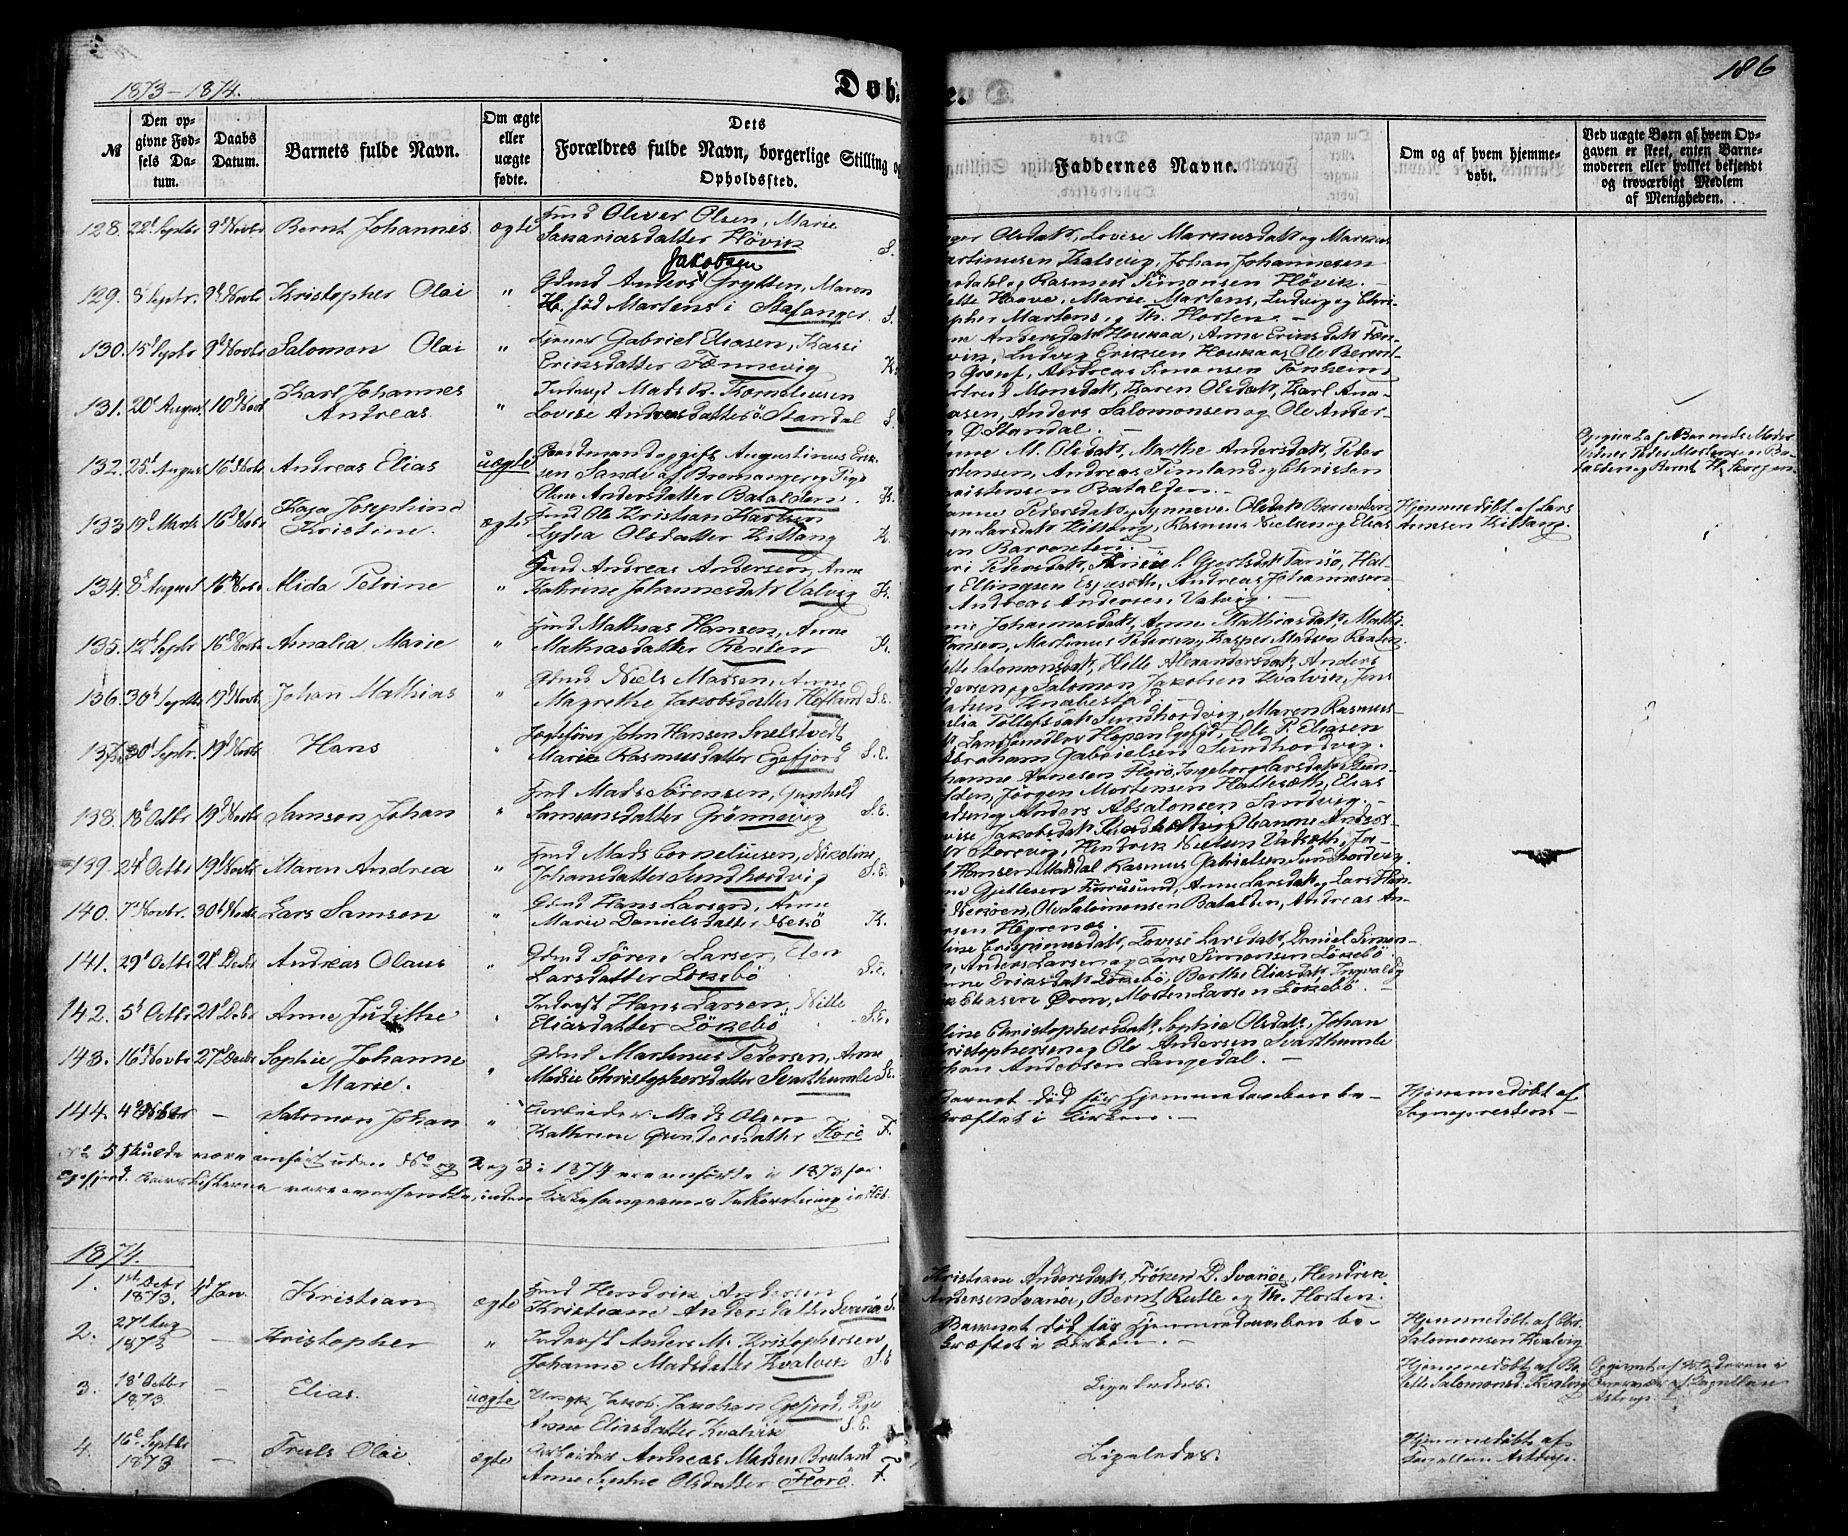 SAB, Kinn sokneprestembete, H/Haa/Haaa/L0006: Ministerialbok nr. A 6, 1857-1885, s. 186